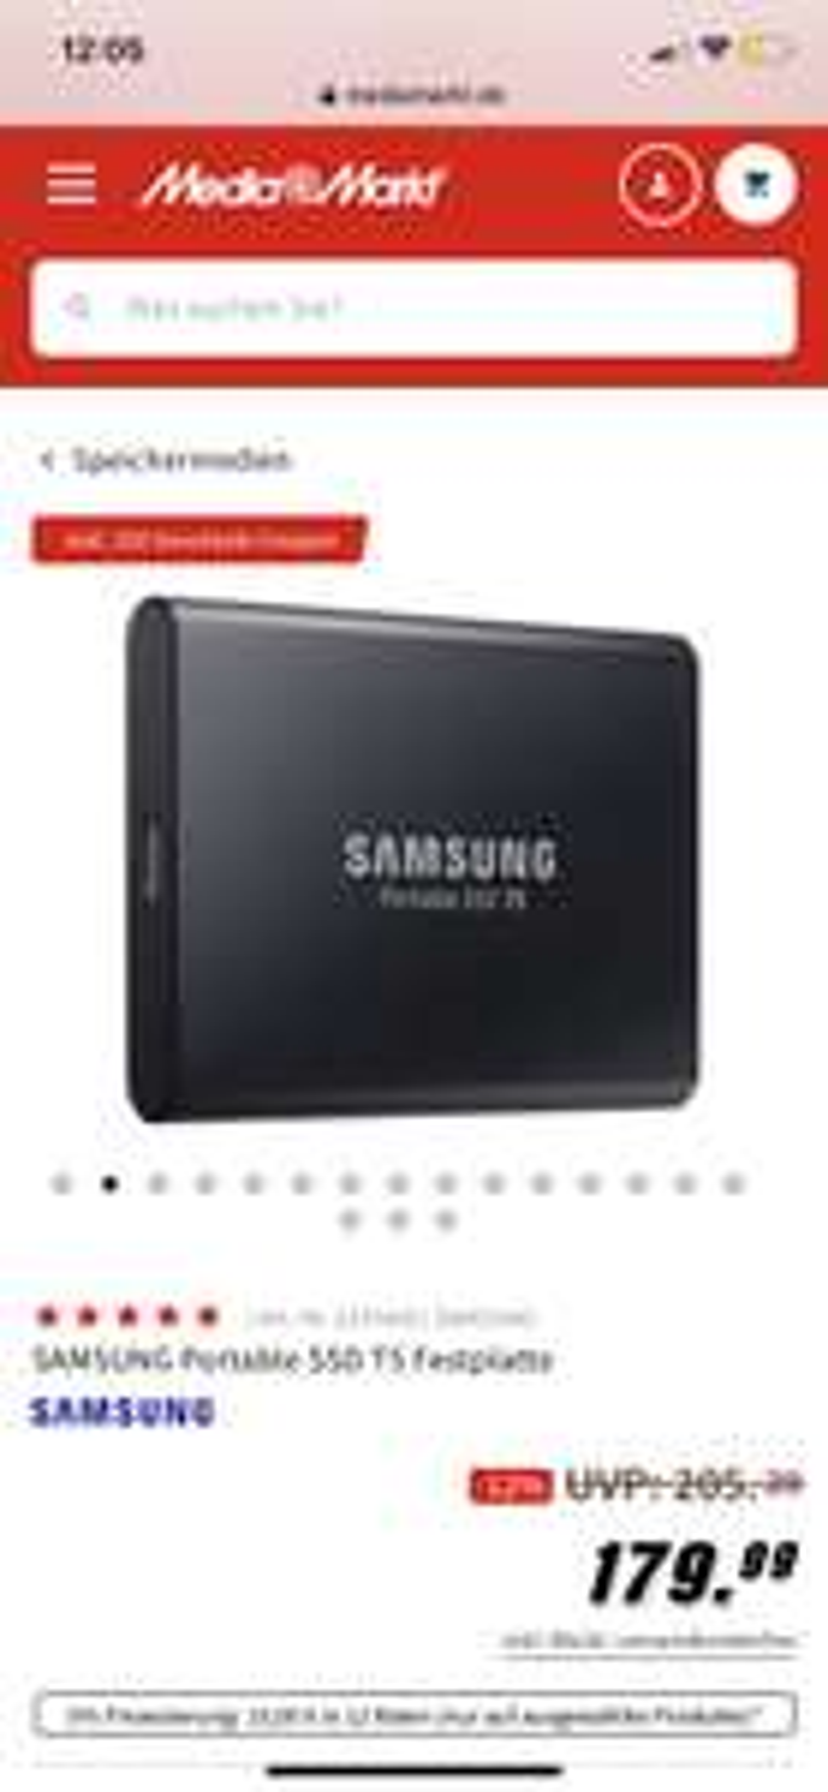 SAMSUNG Portable SSD T5 Festplatte + 25€ Coupon Mediamarkt